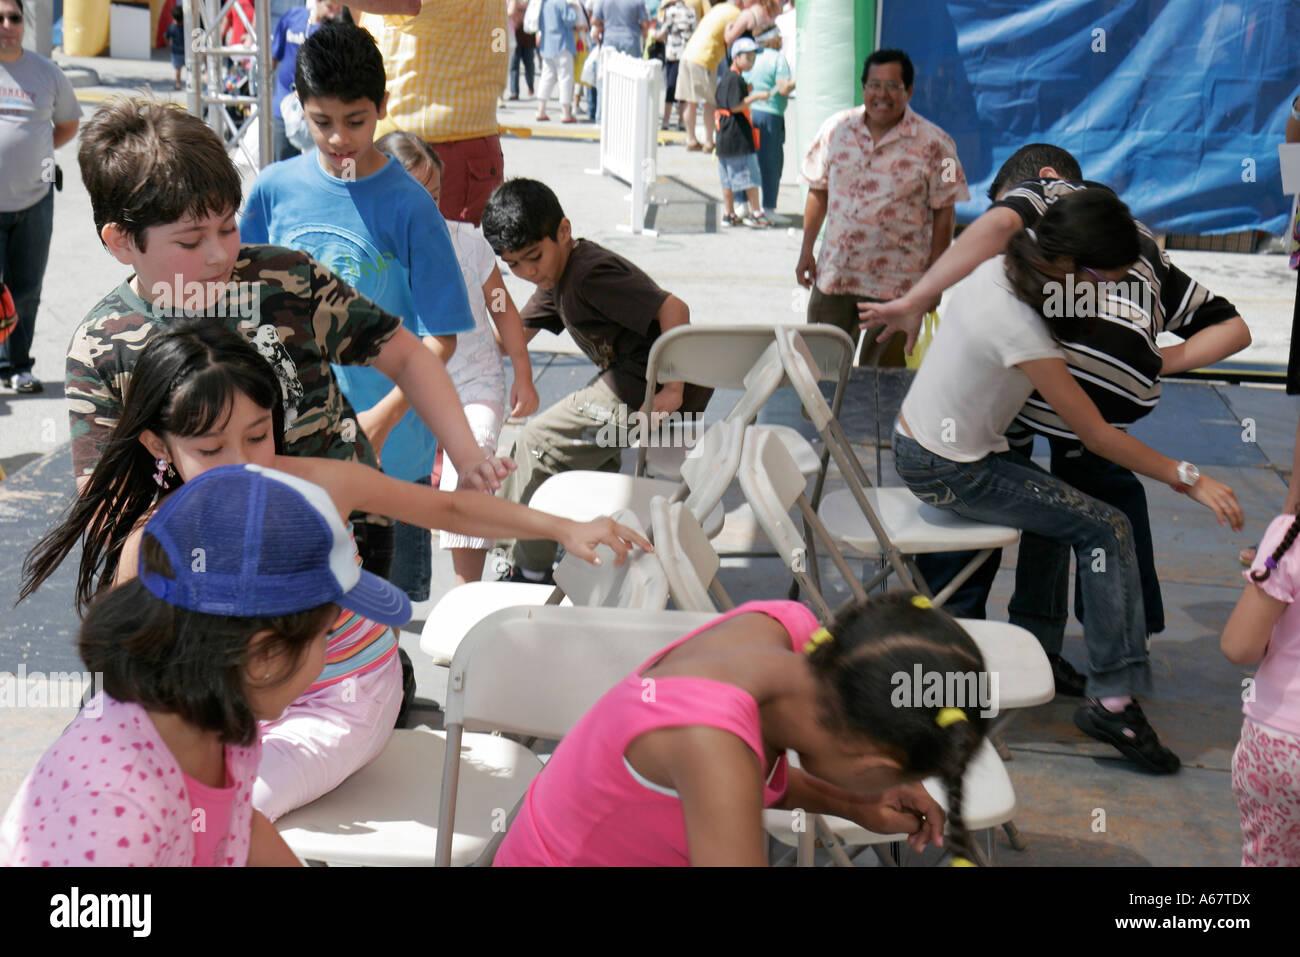 Miami Florida Little Havana Calle Ocho Annual Hispanic Festival Musical  Chairs Boys Girls Contest Game